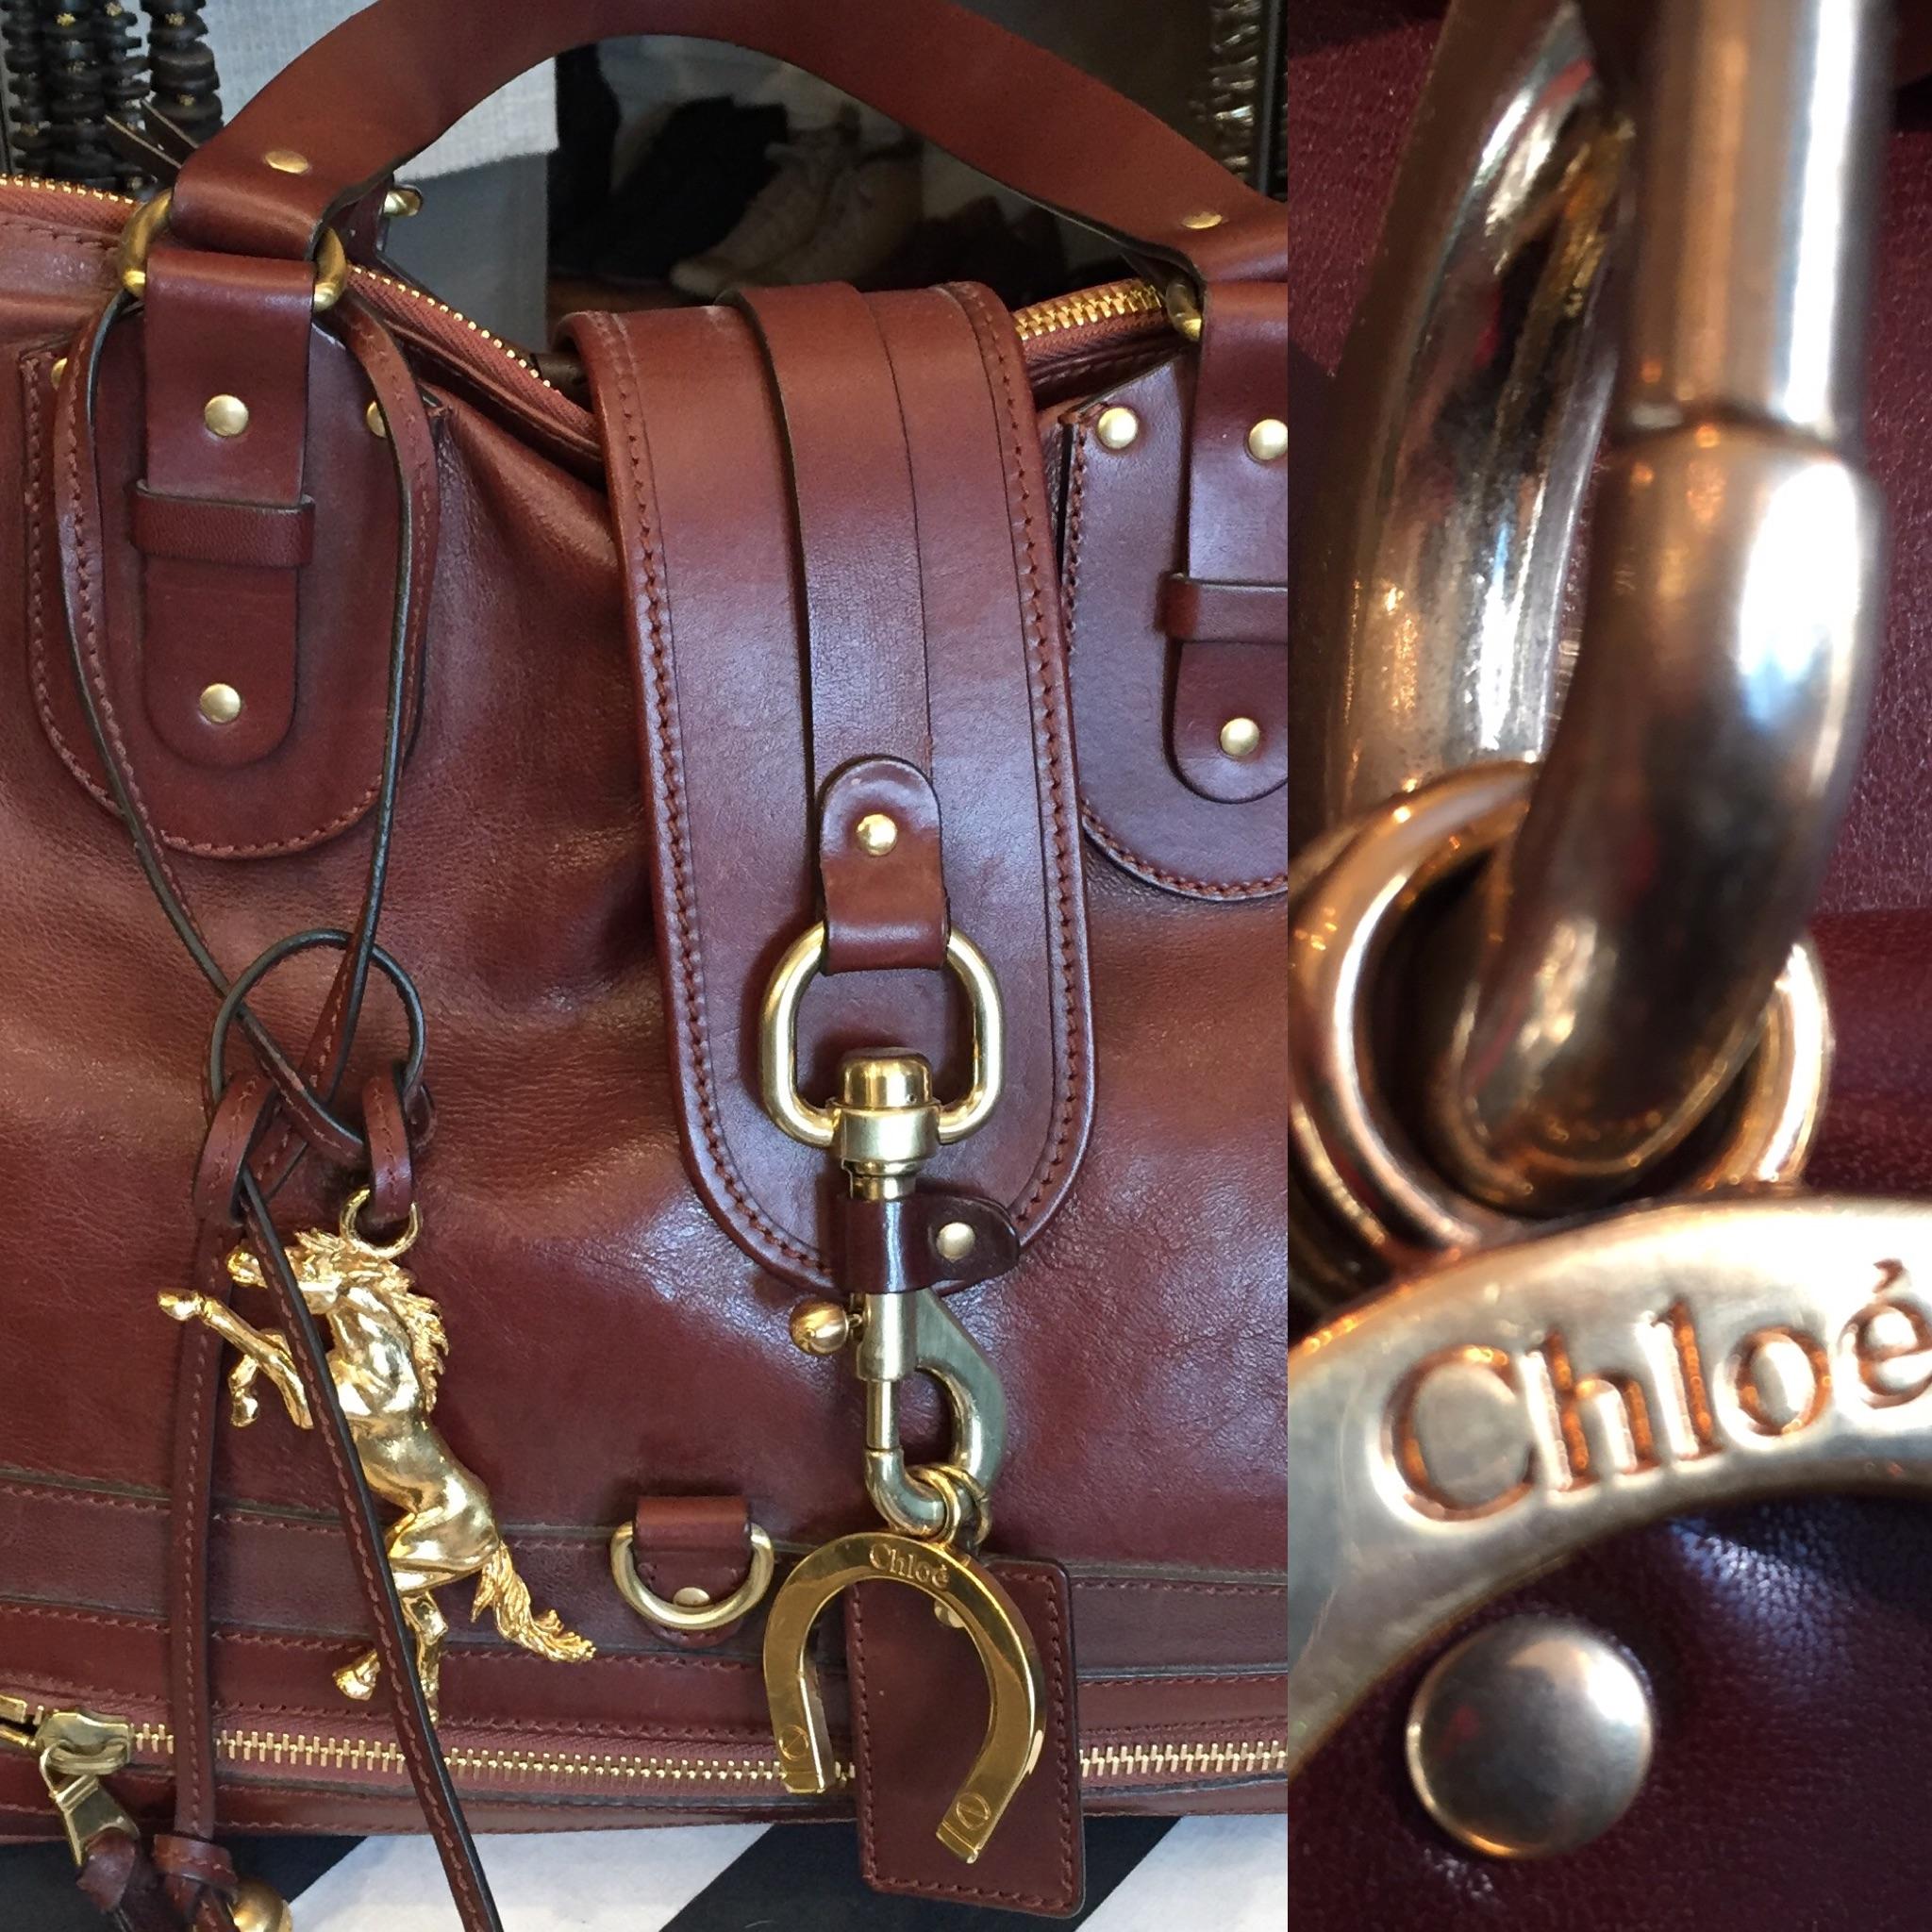 Chloe leather hand bag £499.jpg